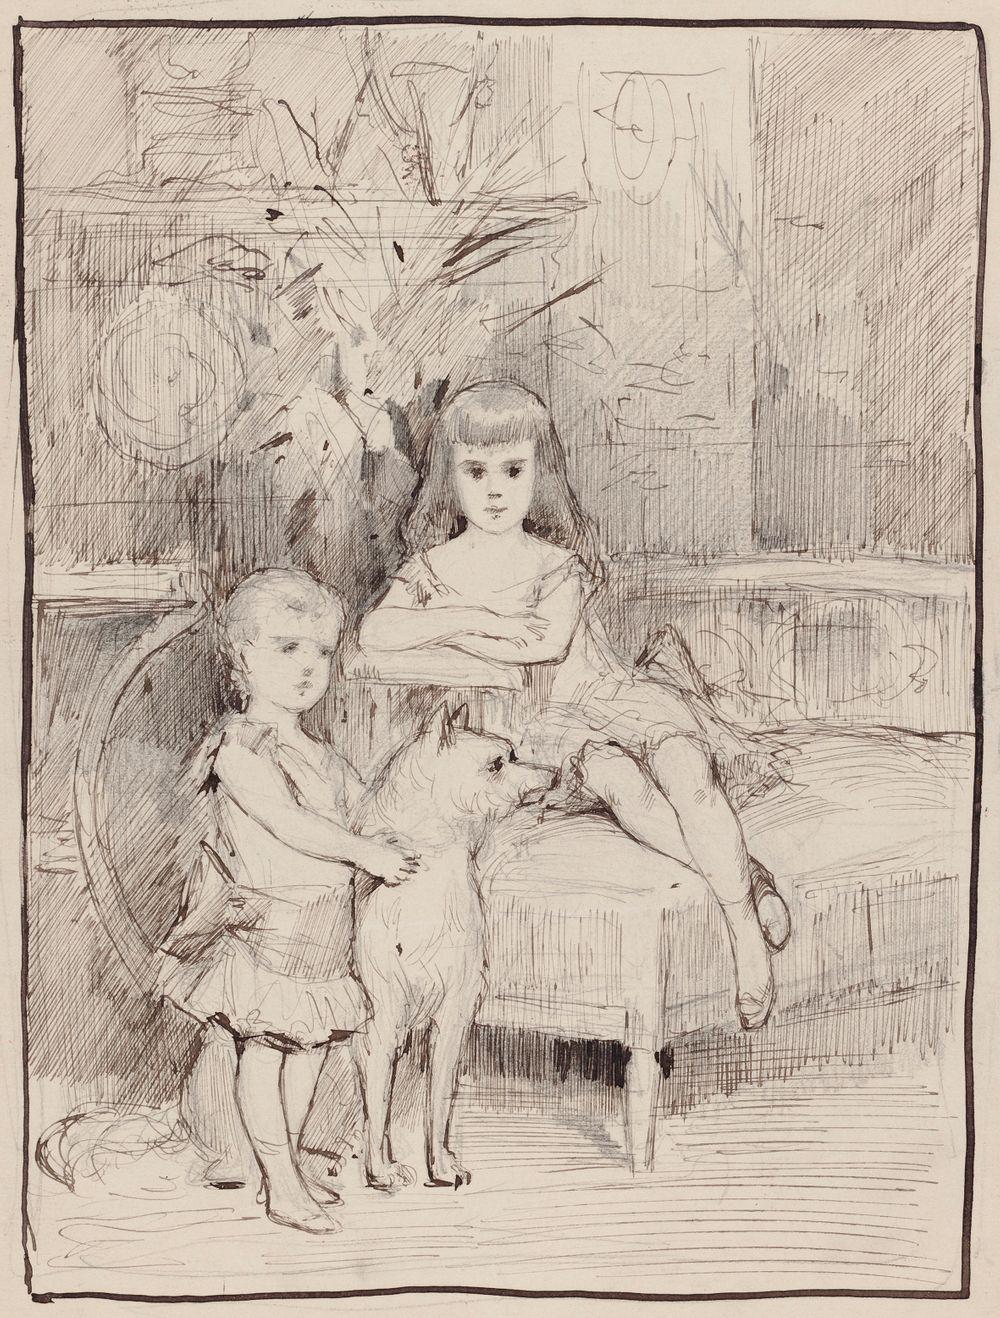 Aleksanteri III:n lapset Mikael ja Xenia, muotokuvaharjoitelma